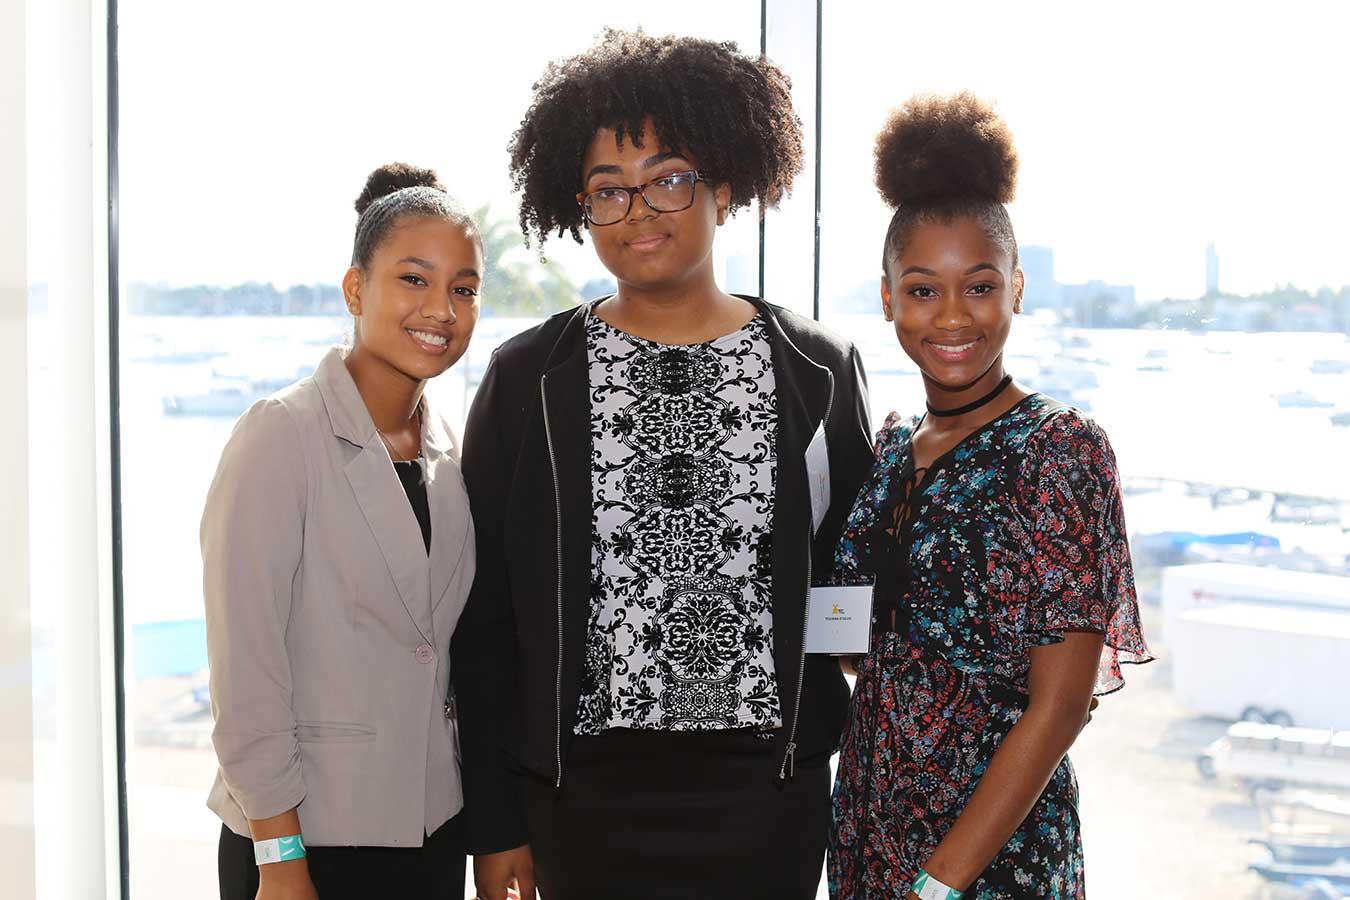 JWOF Scholarship - Encourage emerging powerful women